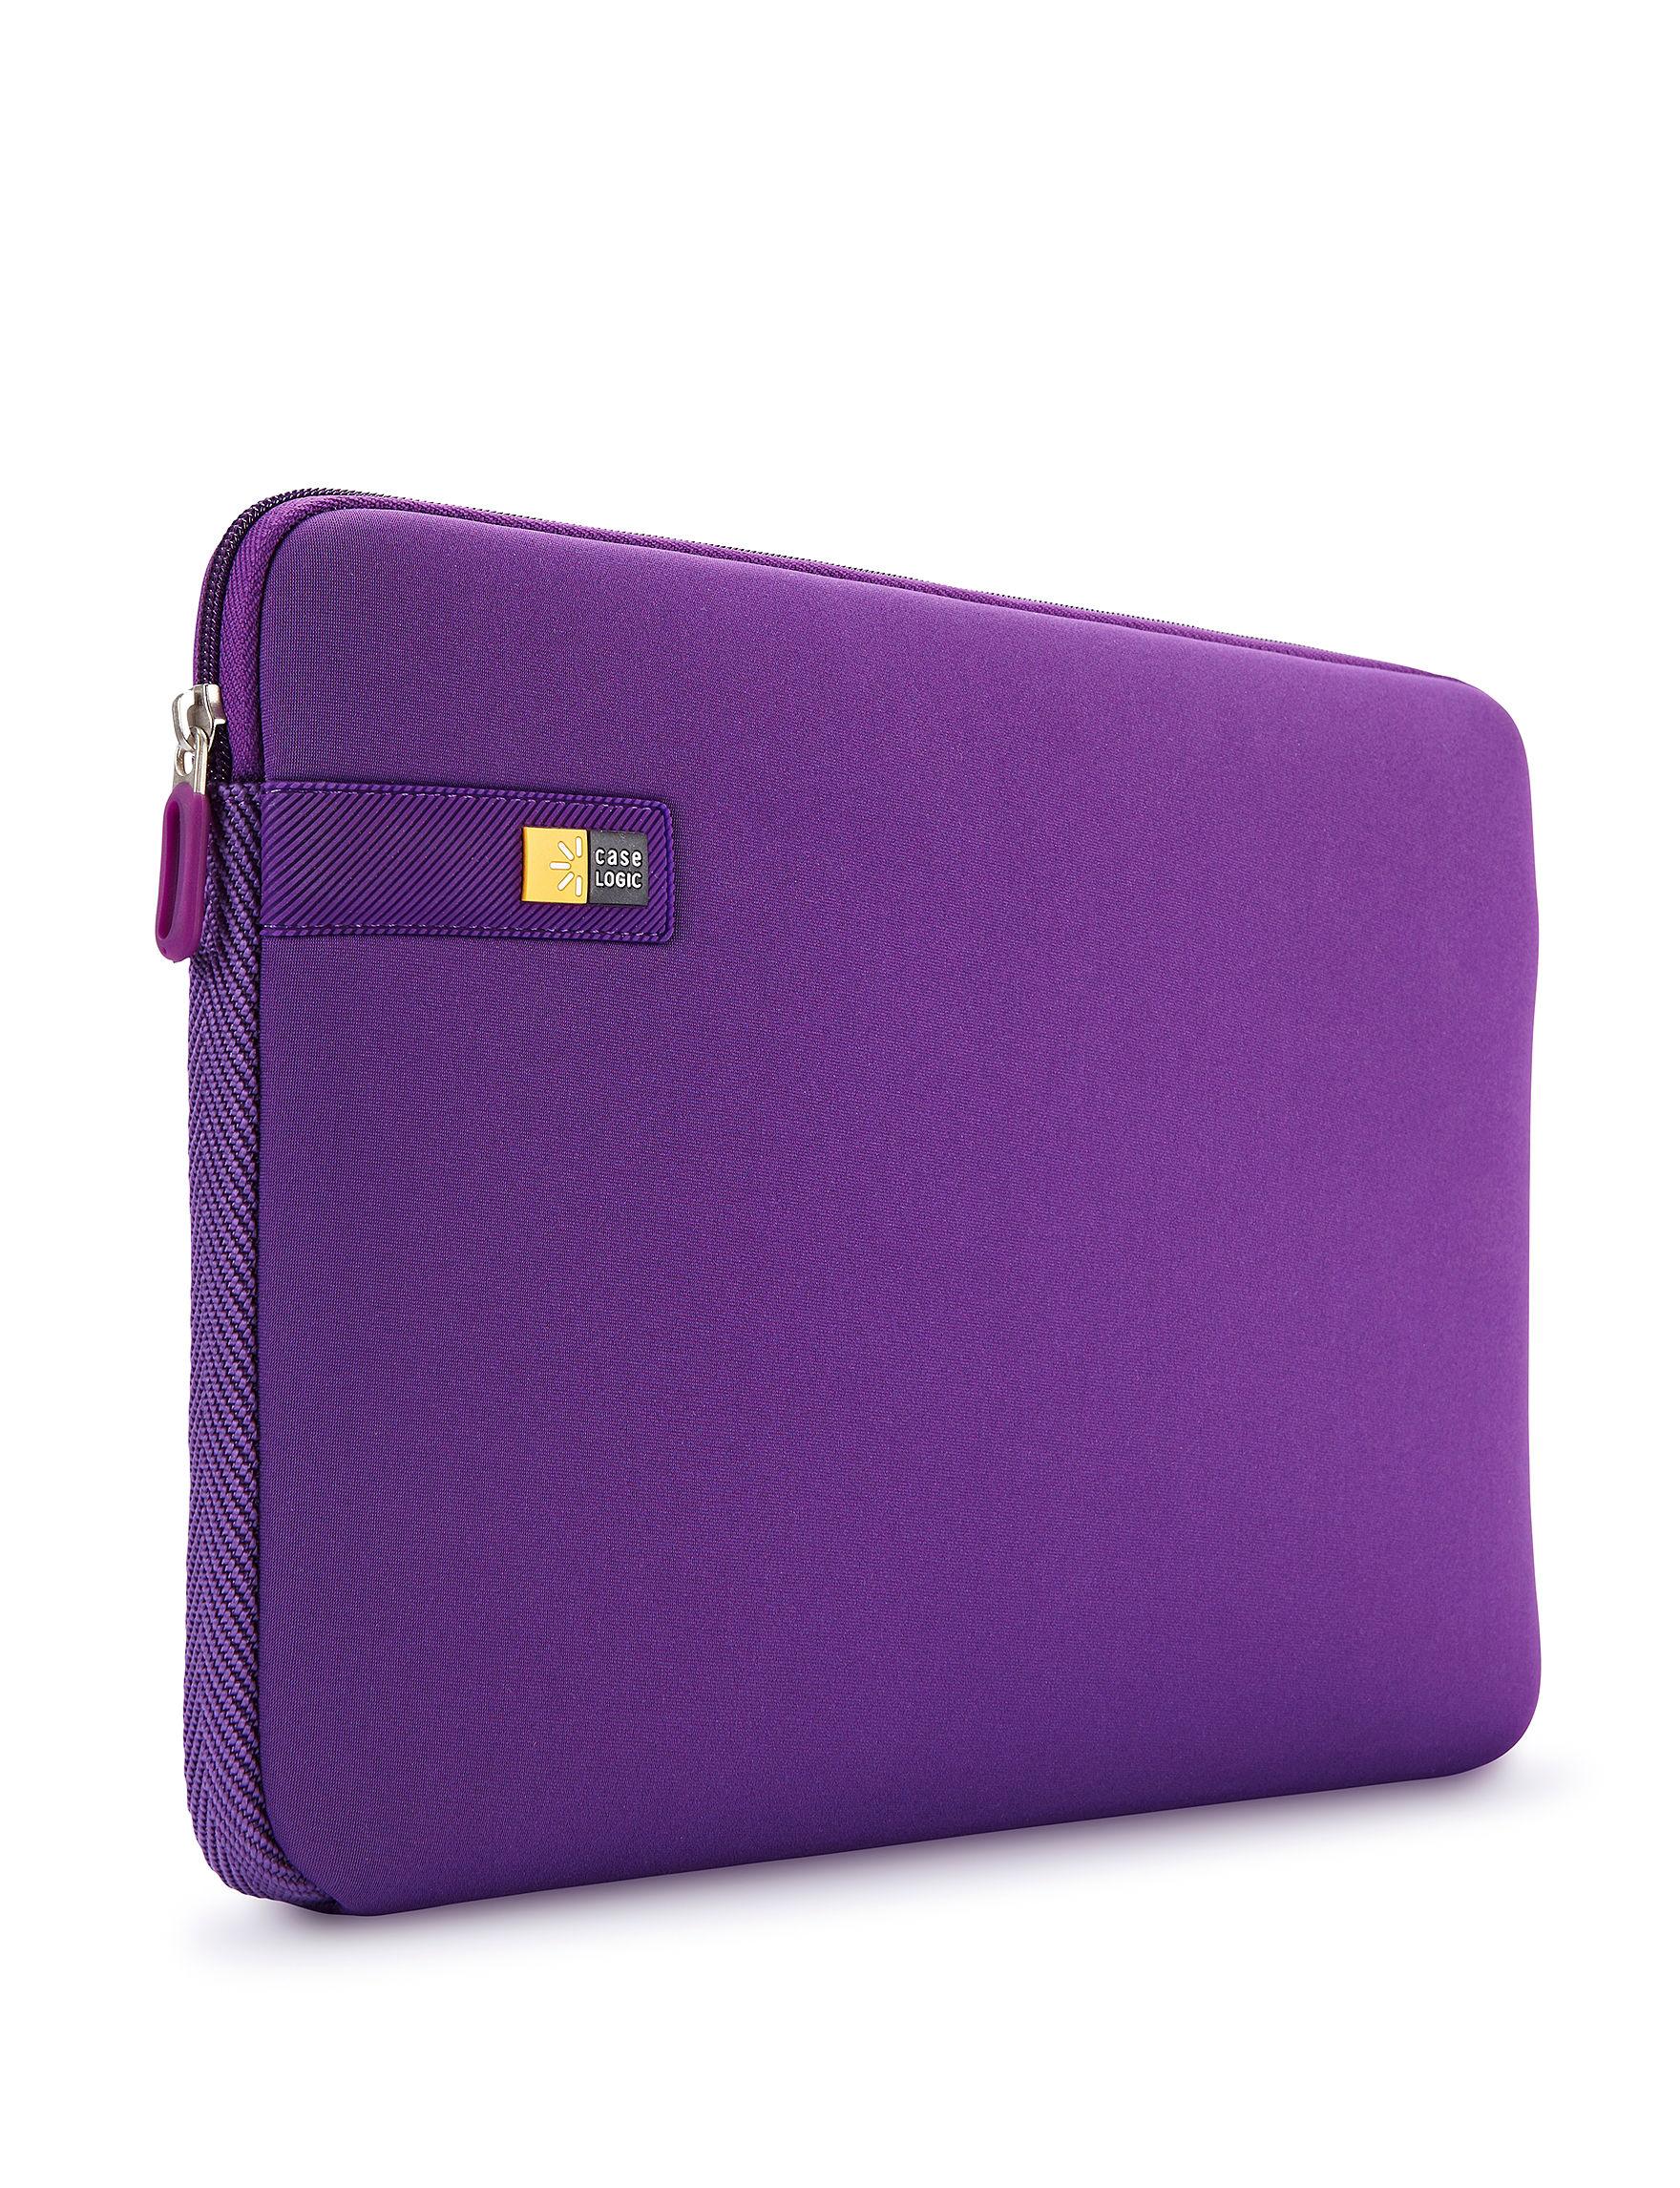 Case Logic Purple Cases & Covers Tech Accessories